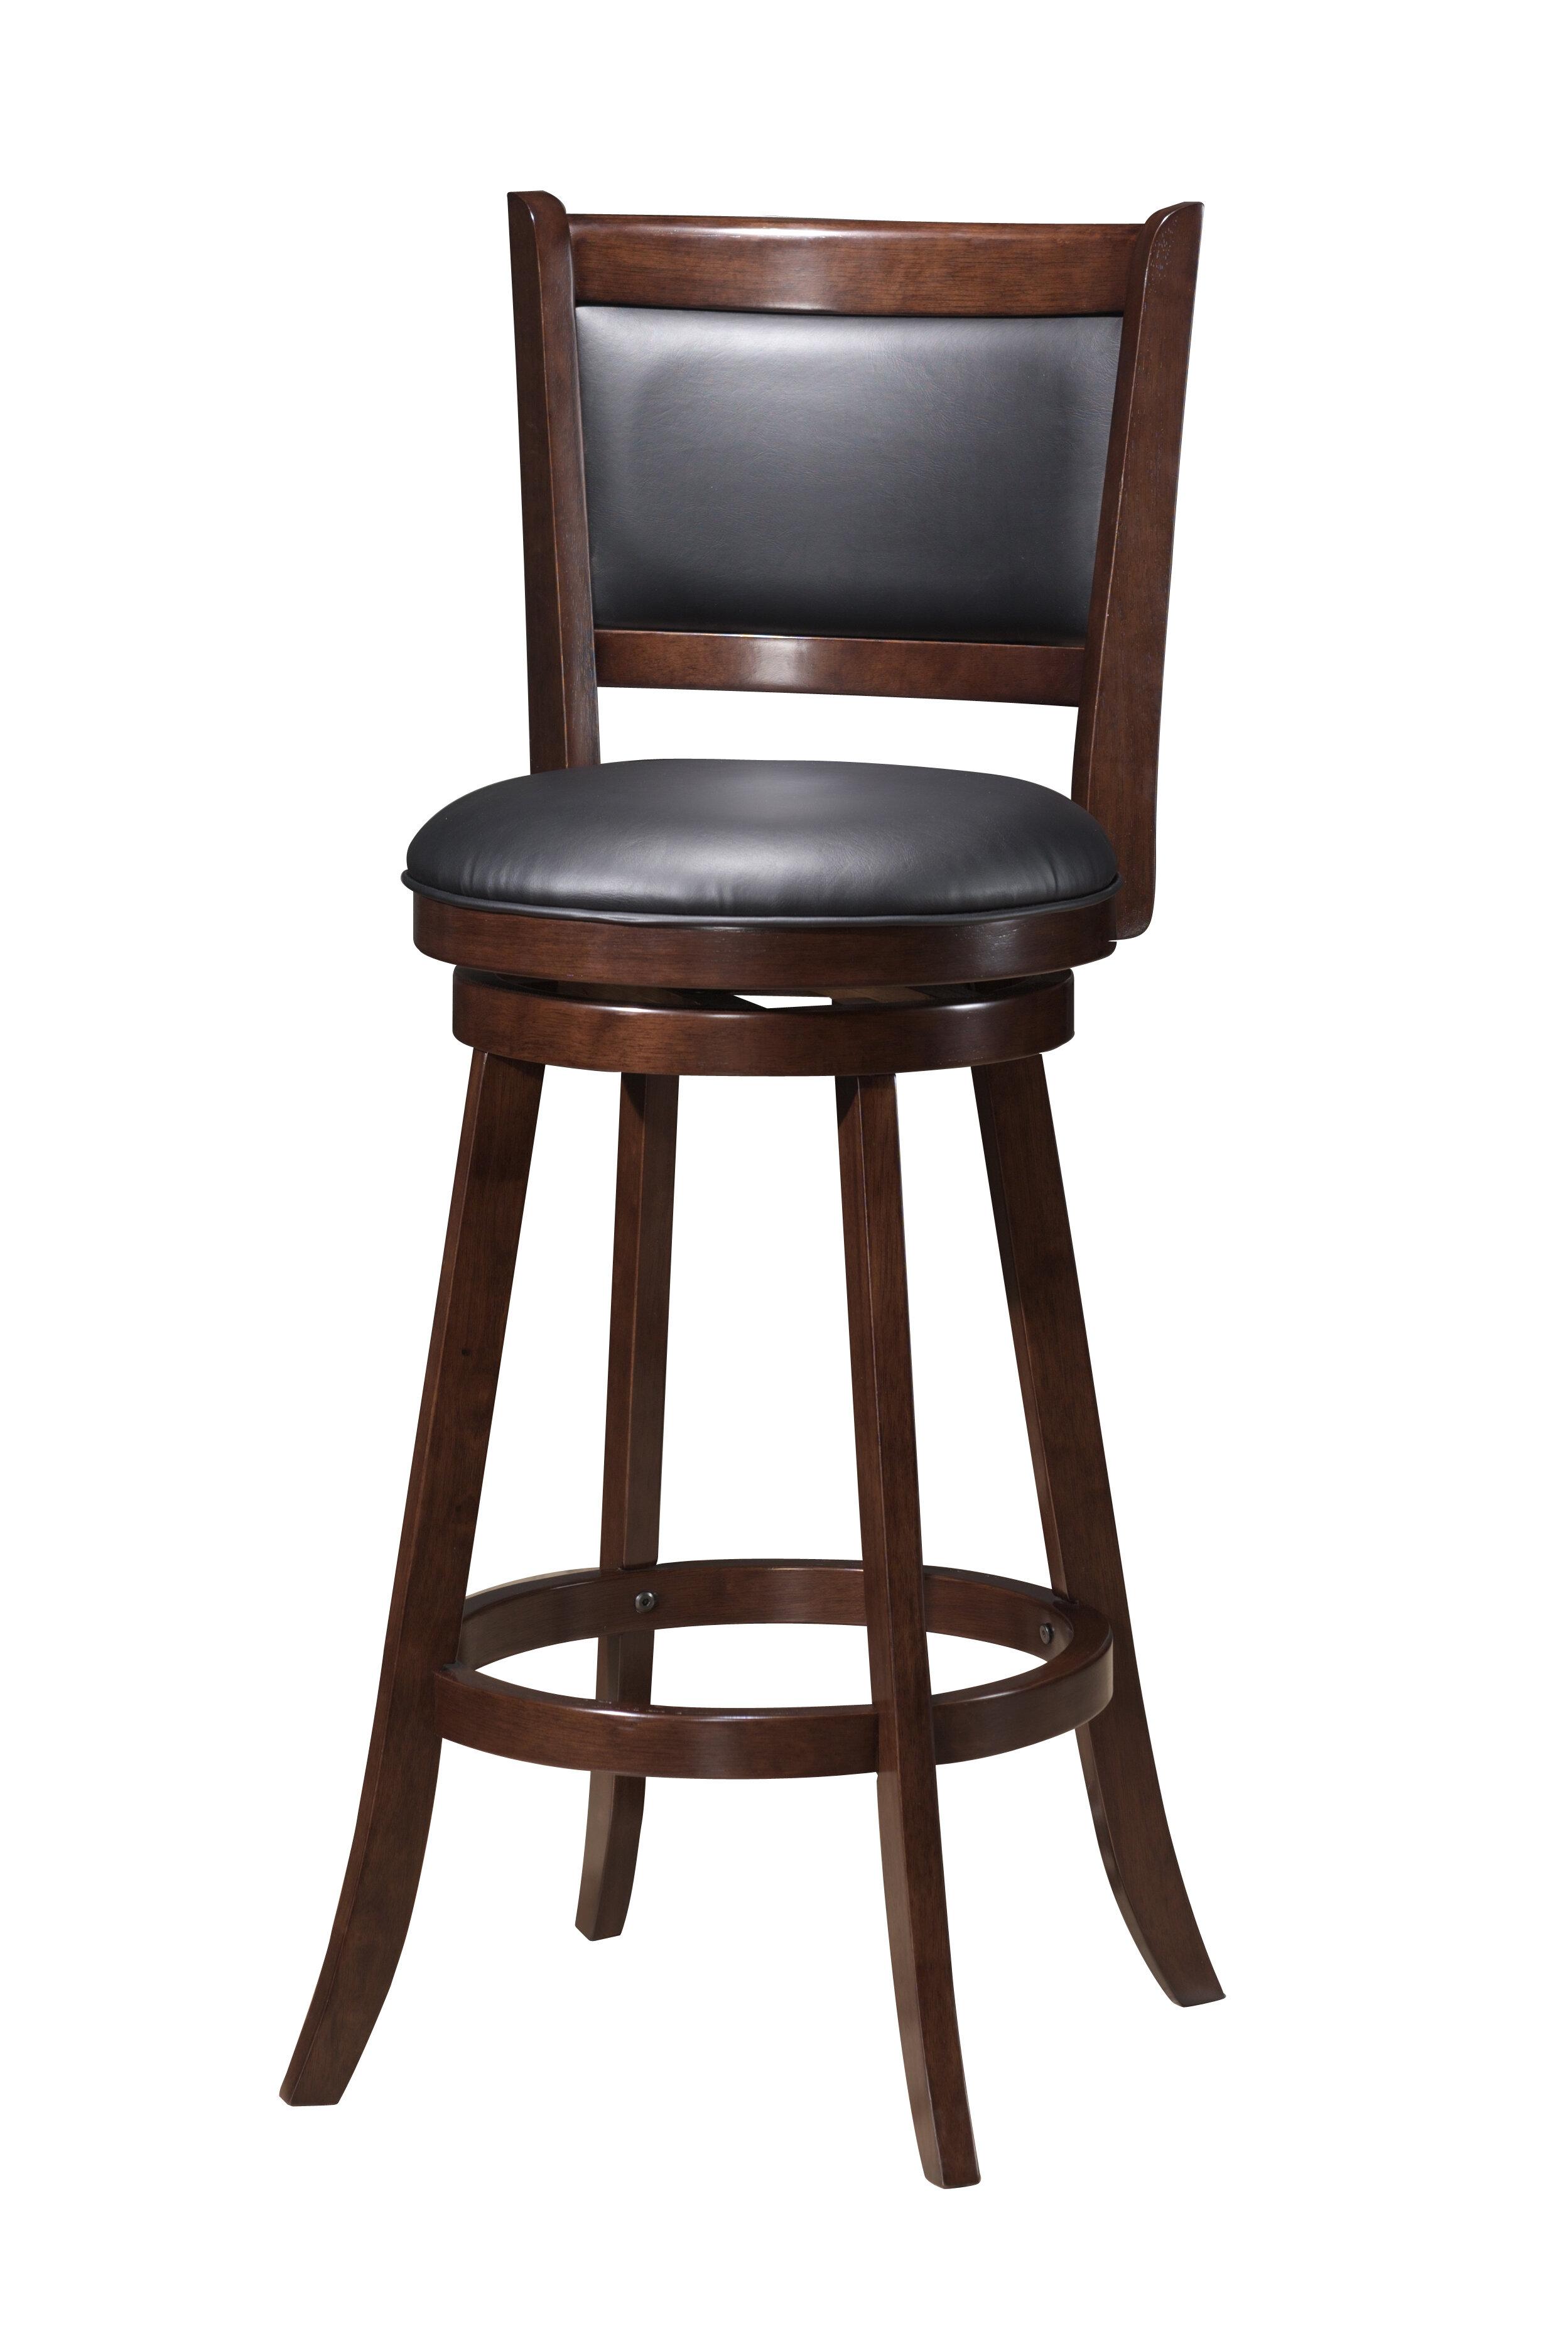 Red barrel studio tuthill wooden swivel bar stool reviews wayfair